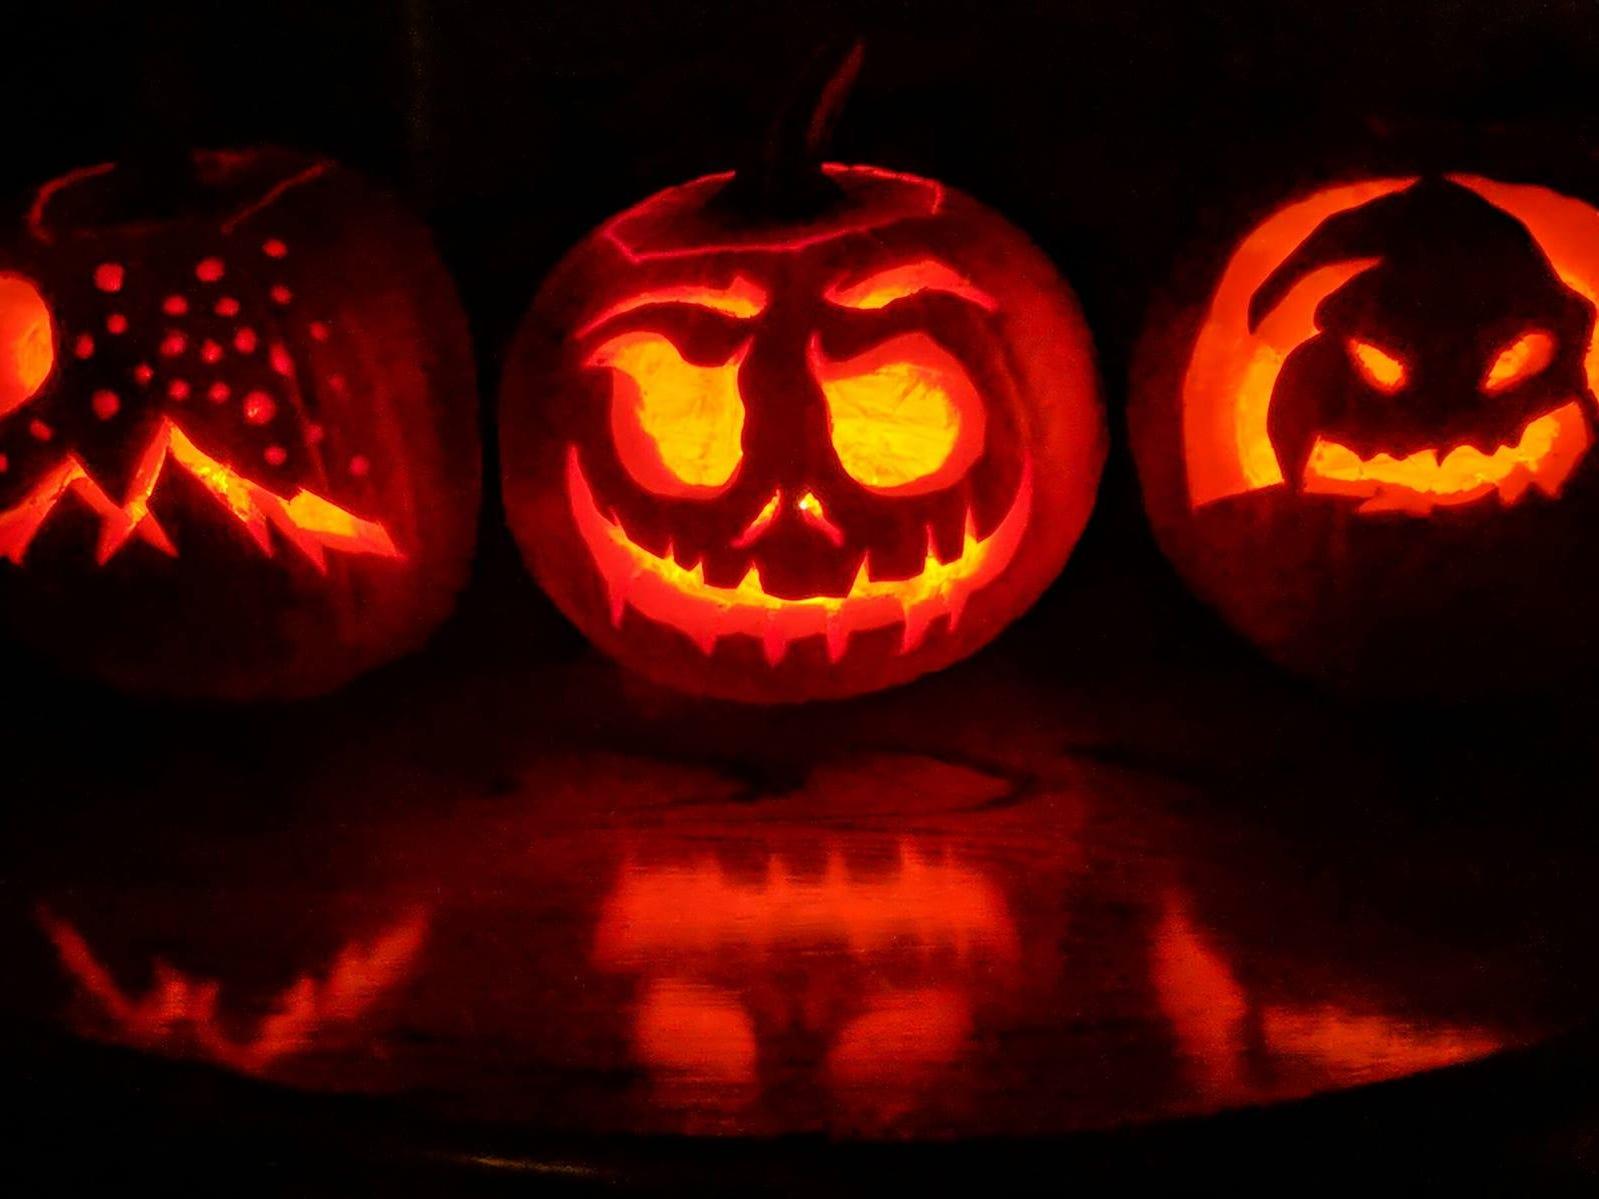 Pumpkins by the Villagrana family - Saul, Jamie, Emily and Gavin.